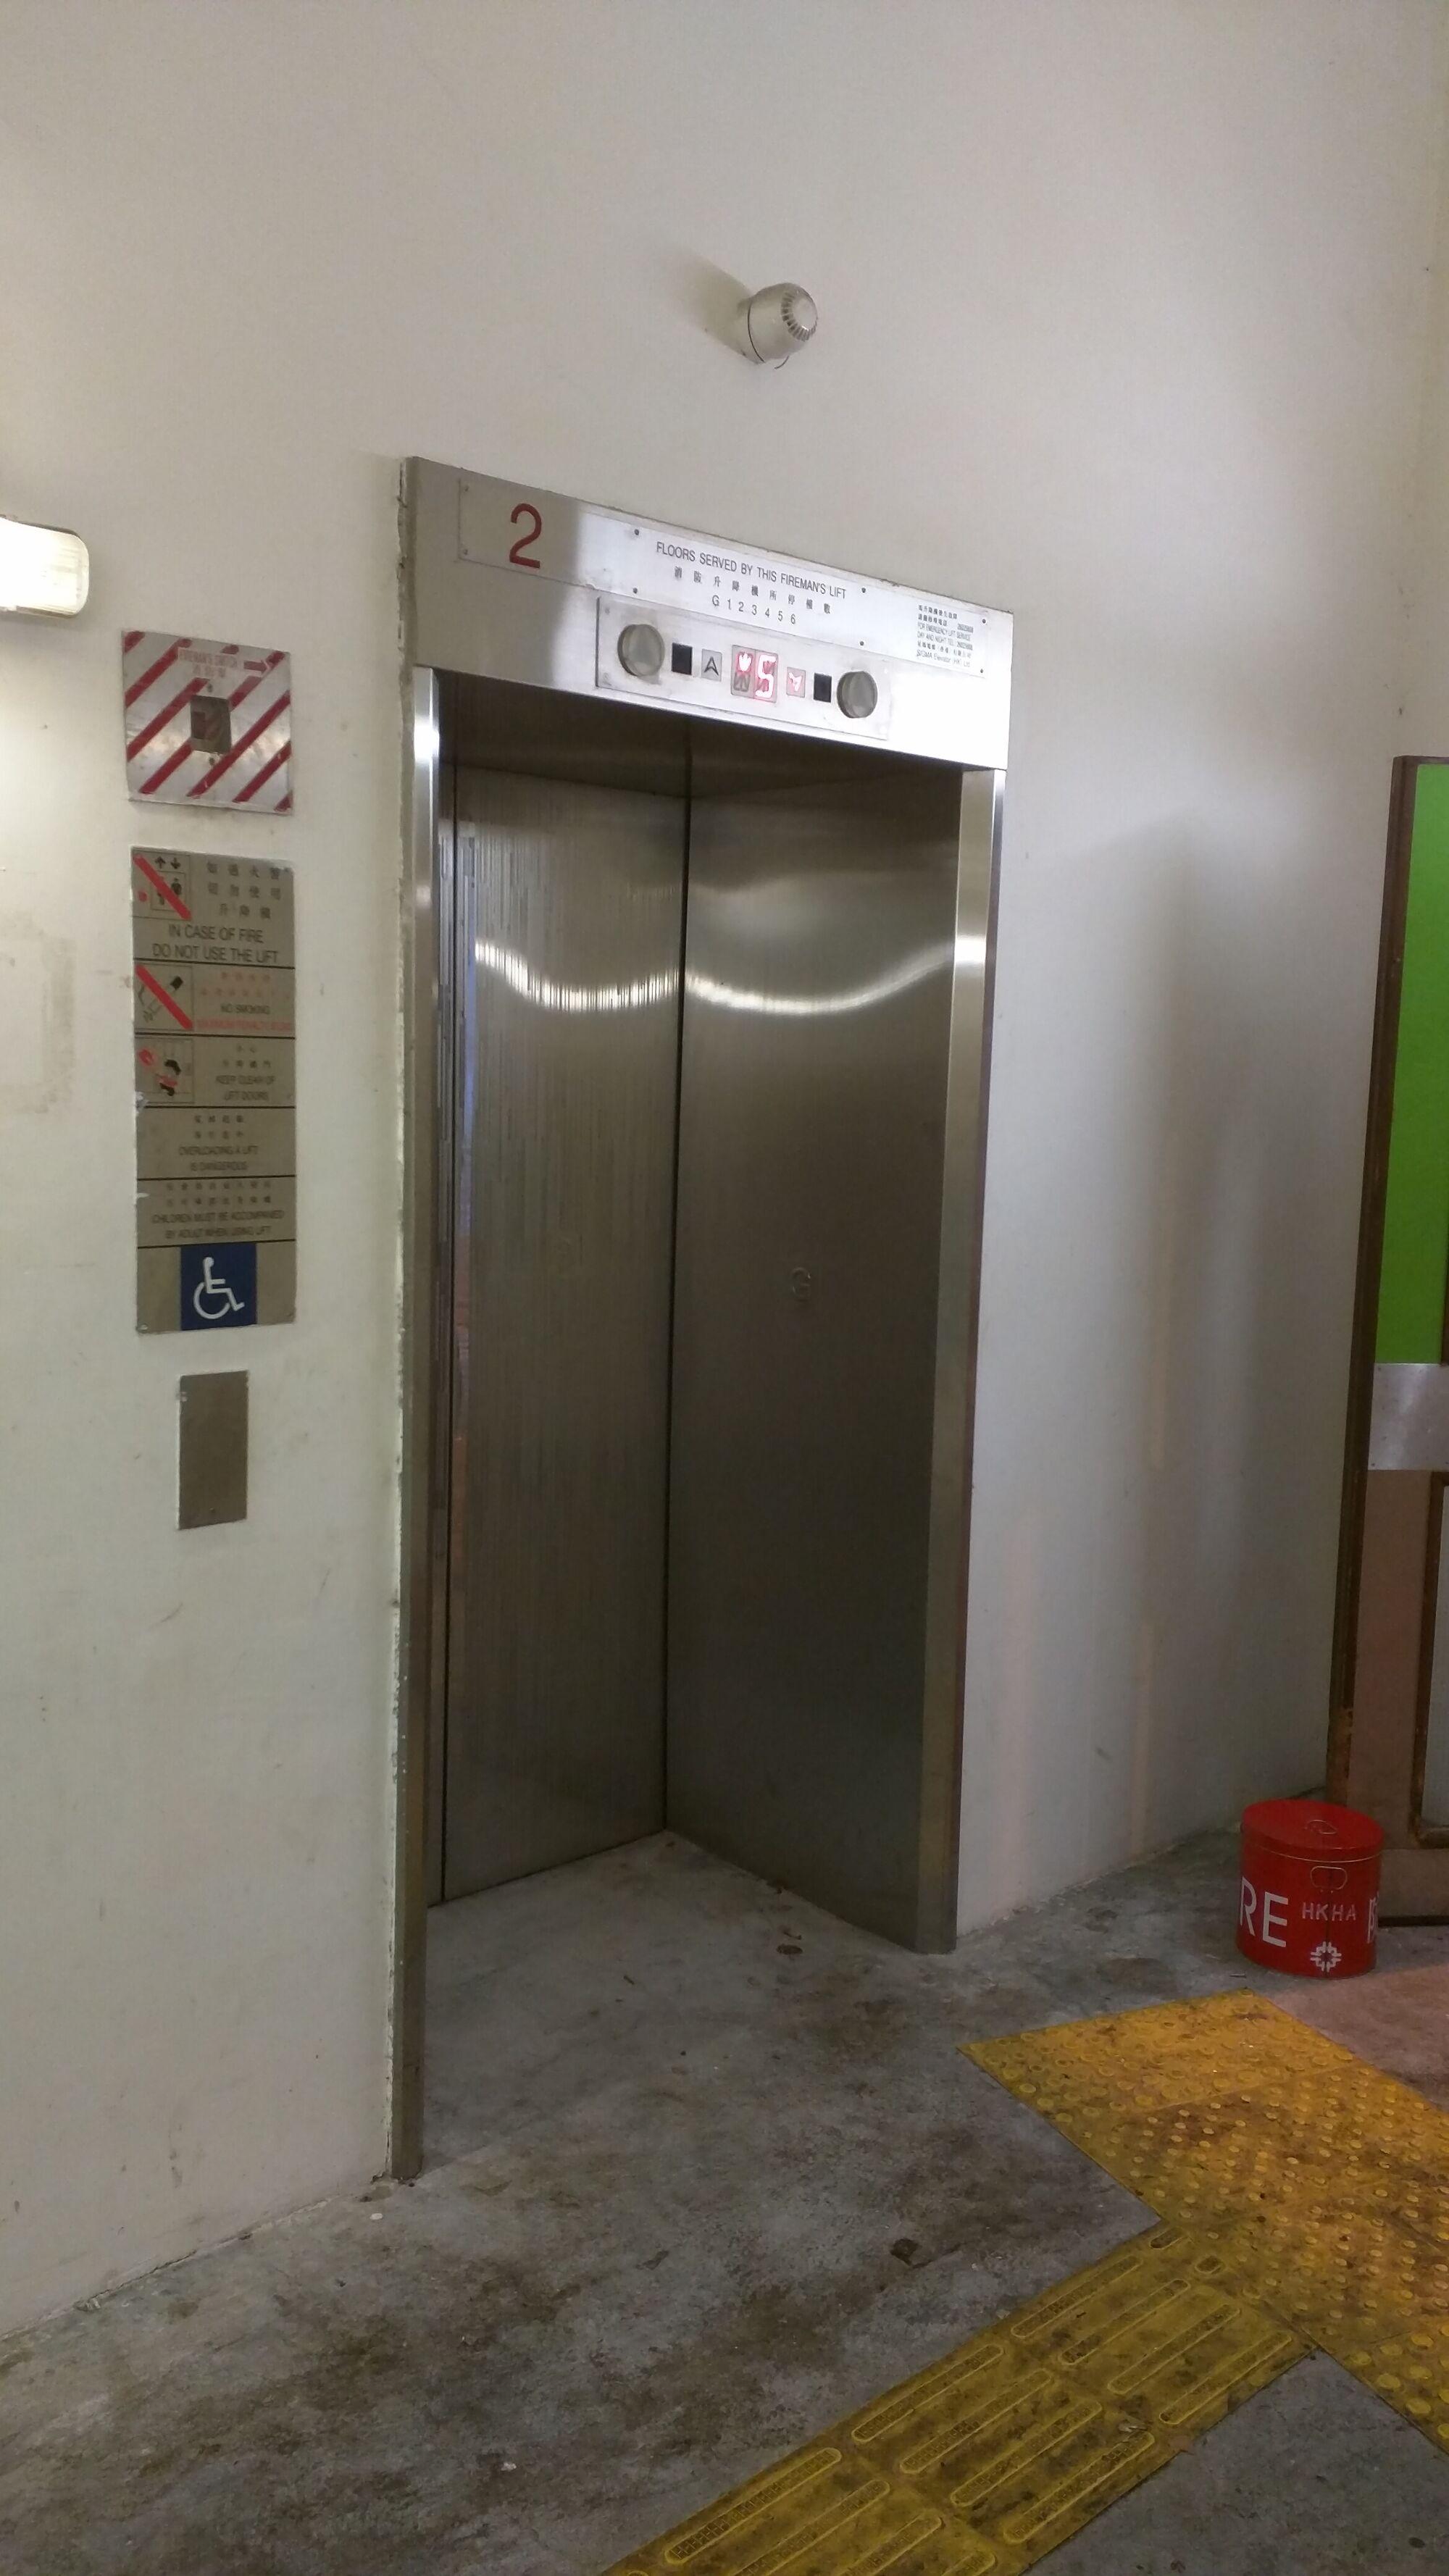 Fireman's elevator | Elevator Wiki | FANDOM powered by Wikia